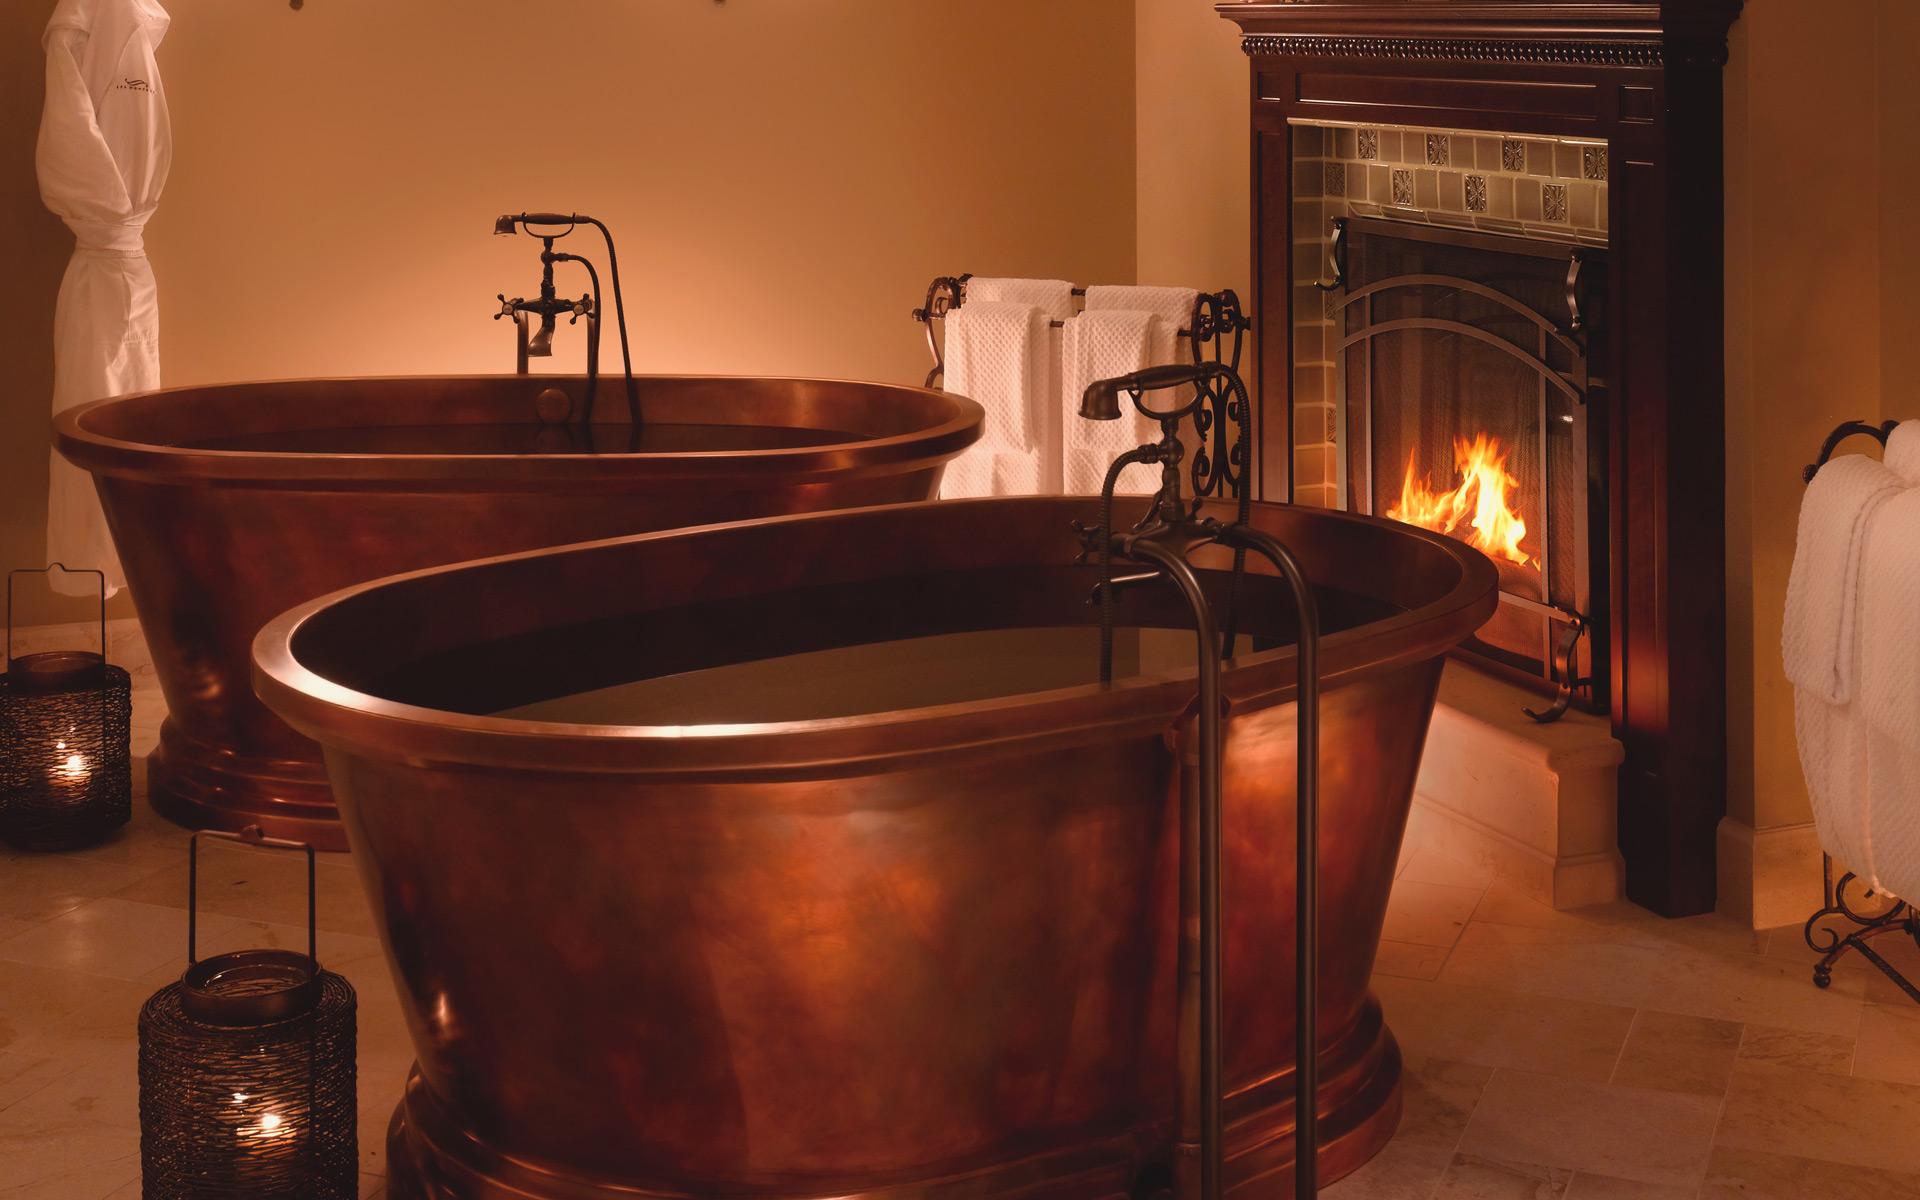 Mr. Luxury Ski prefers to have his apres-ski soak by a crackling fire.